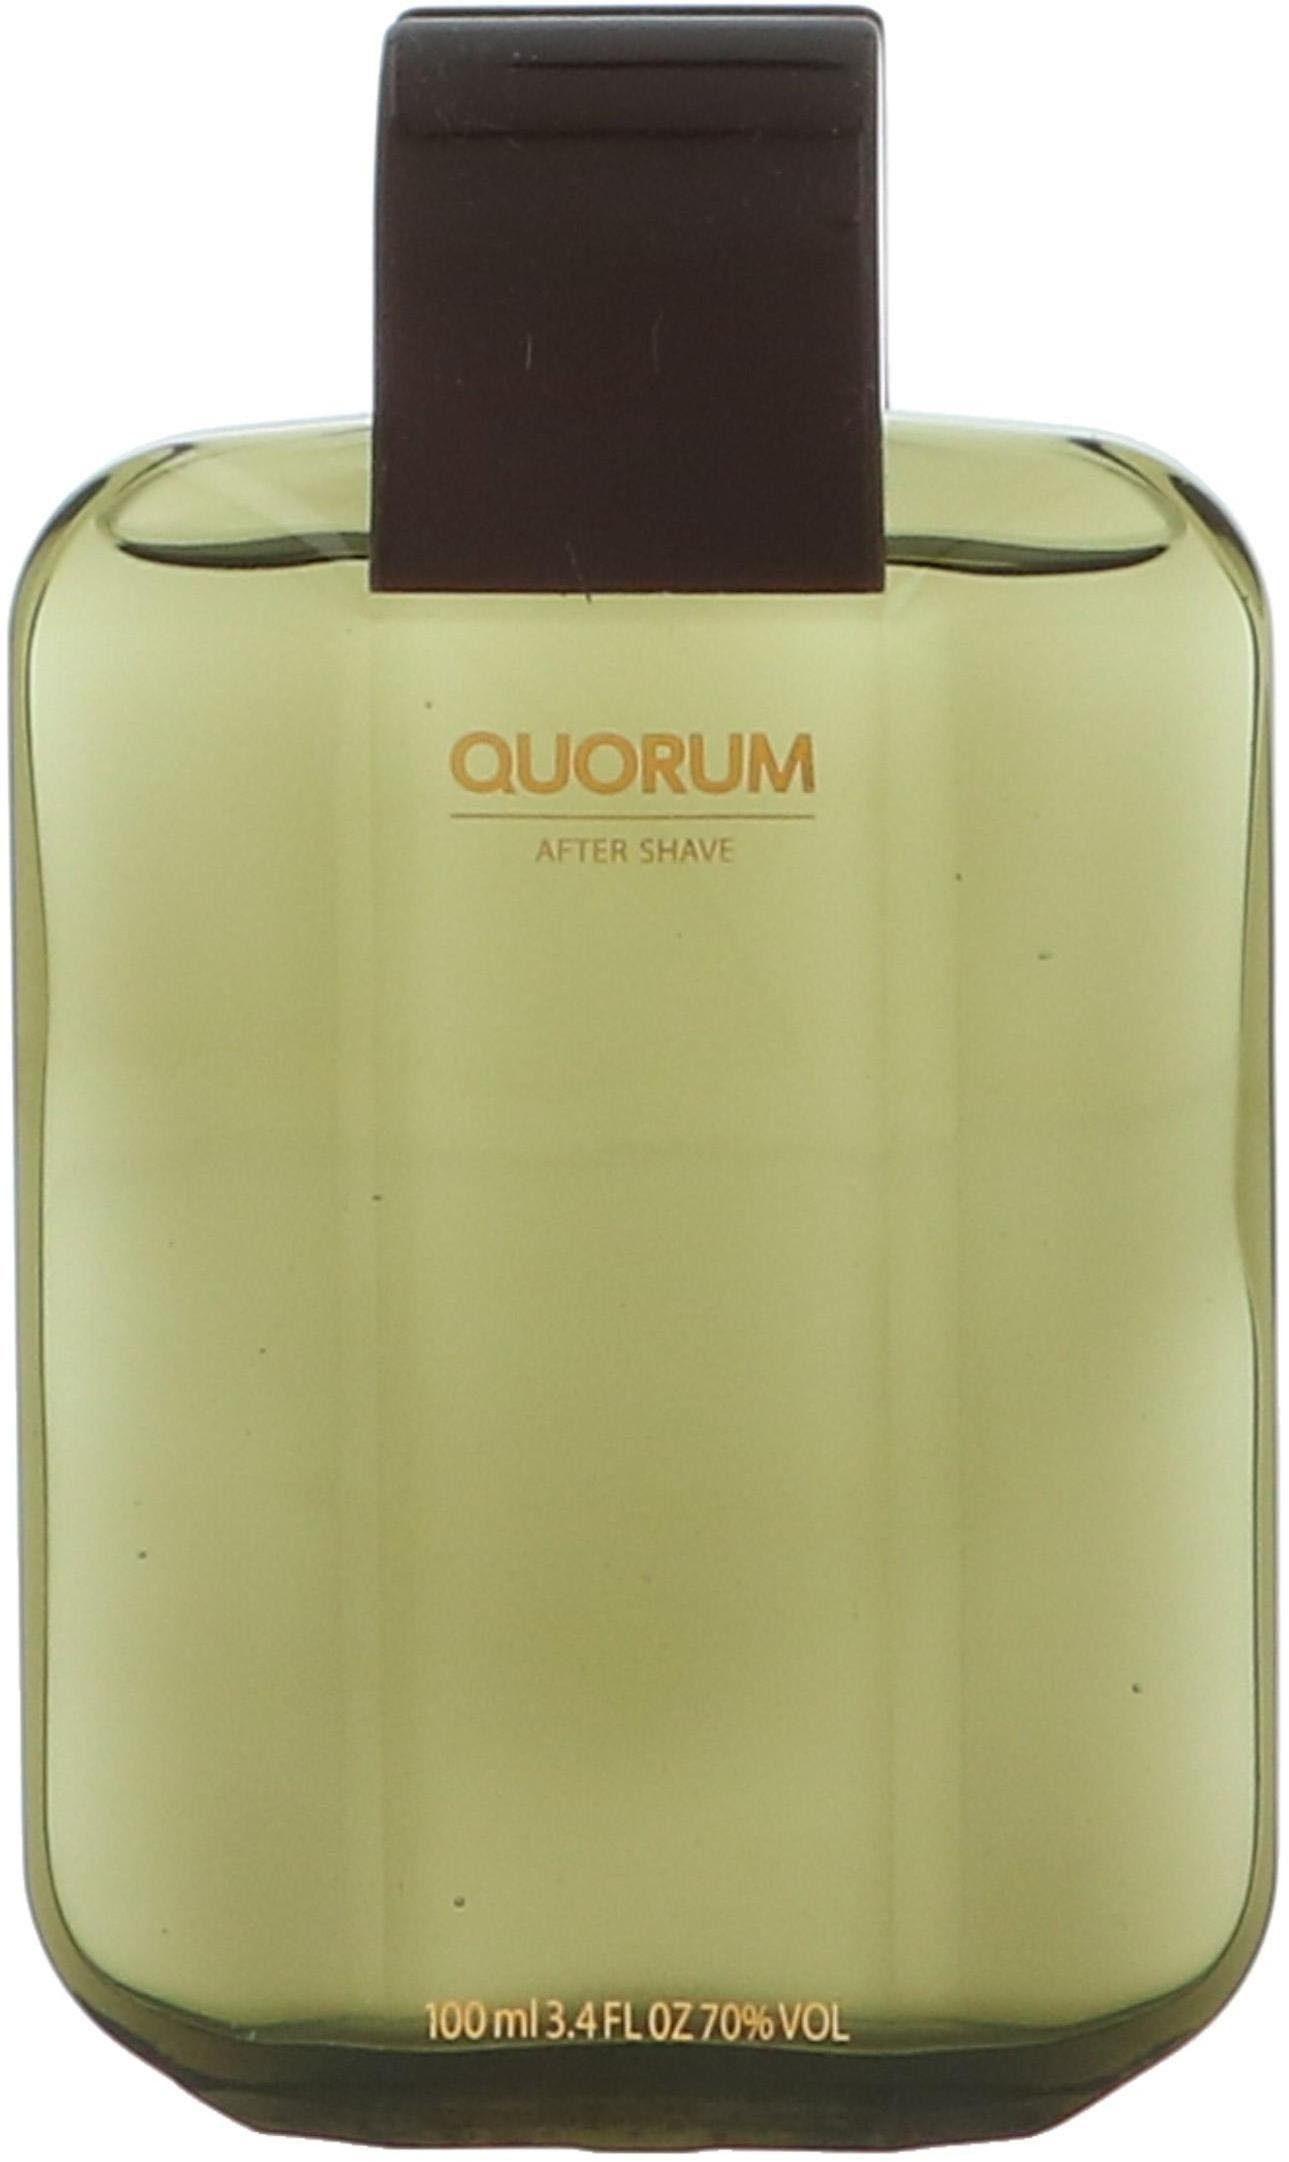 Antonio Puig, »Quorum Aftershave«, Aftershave